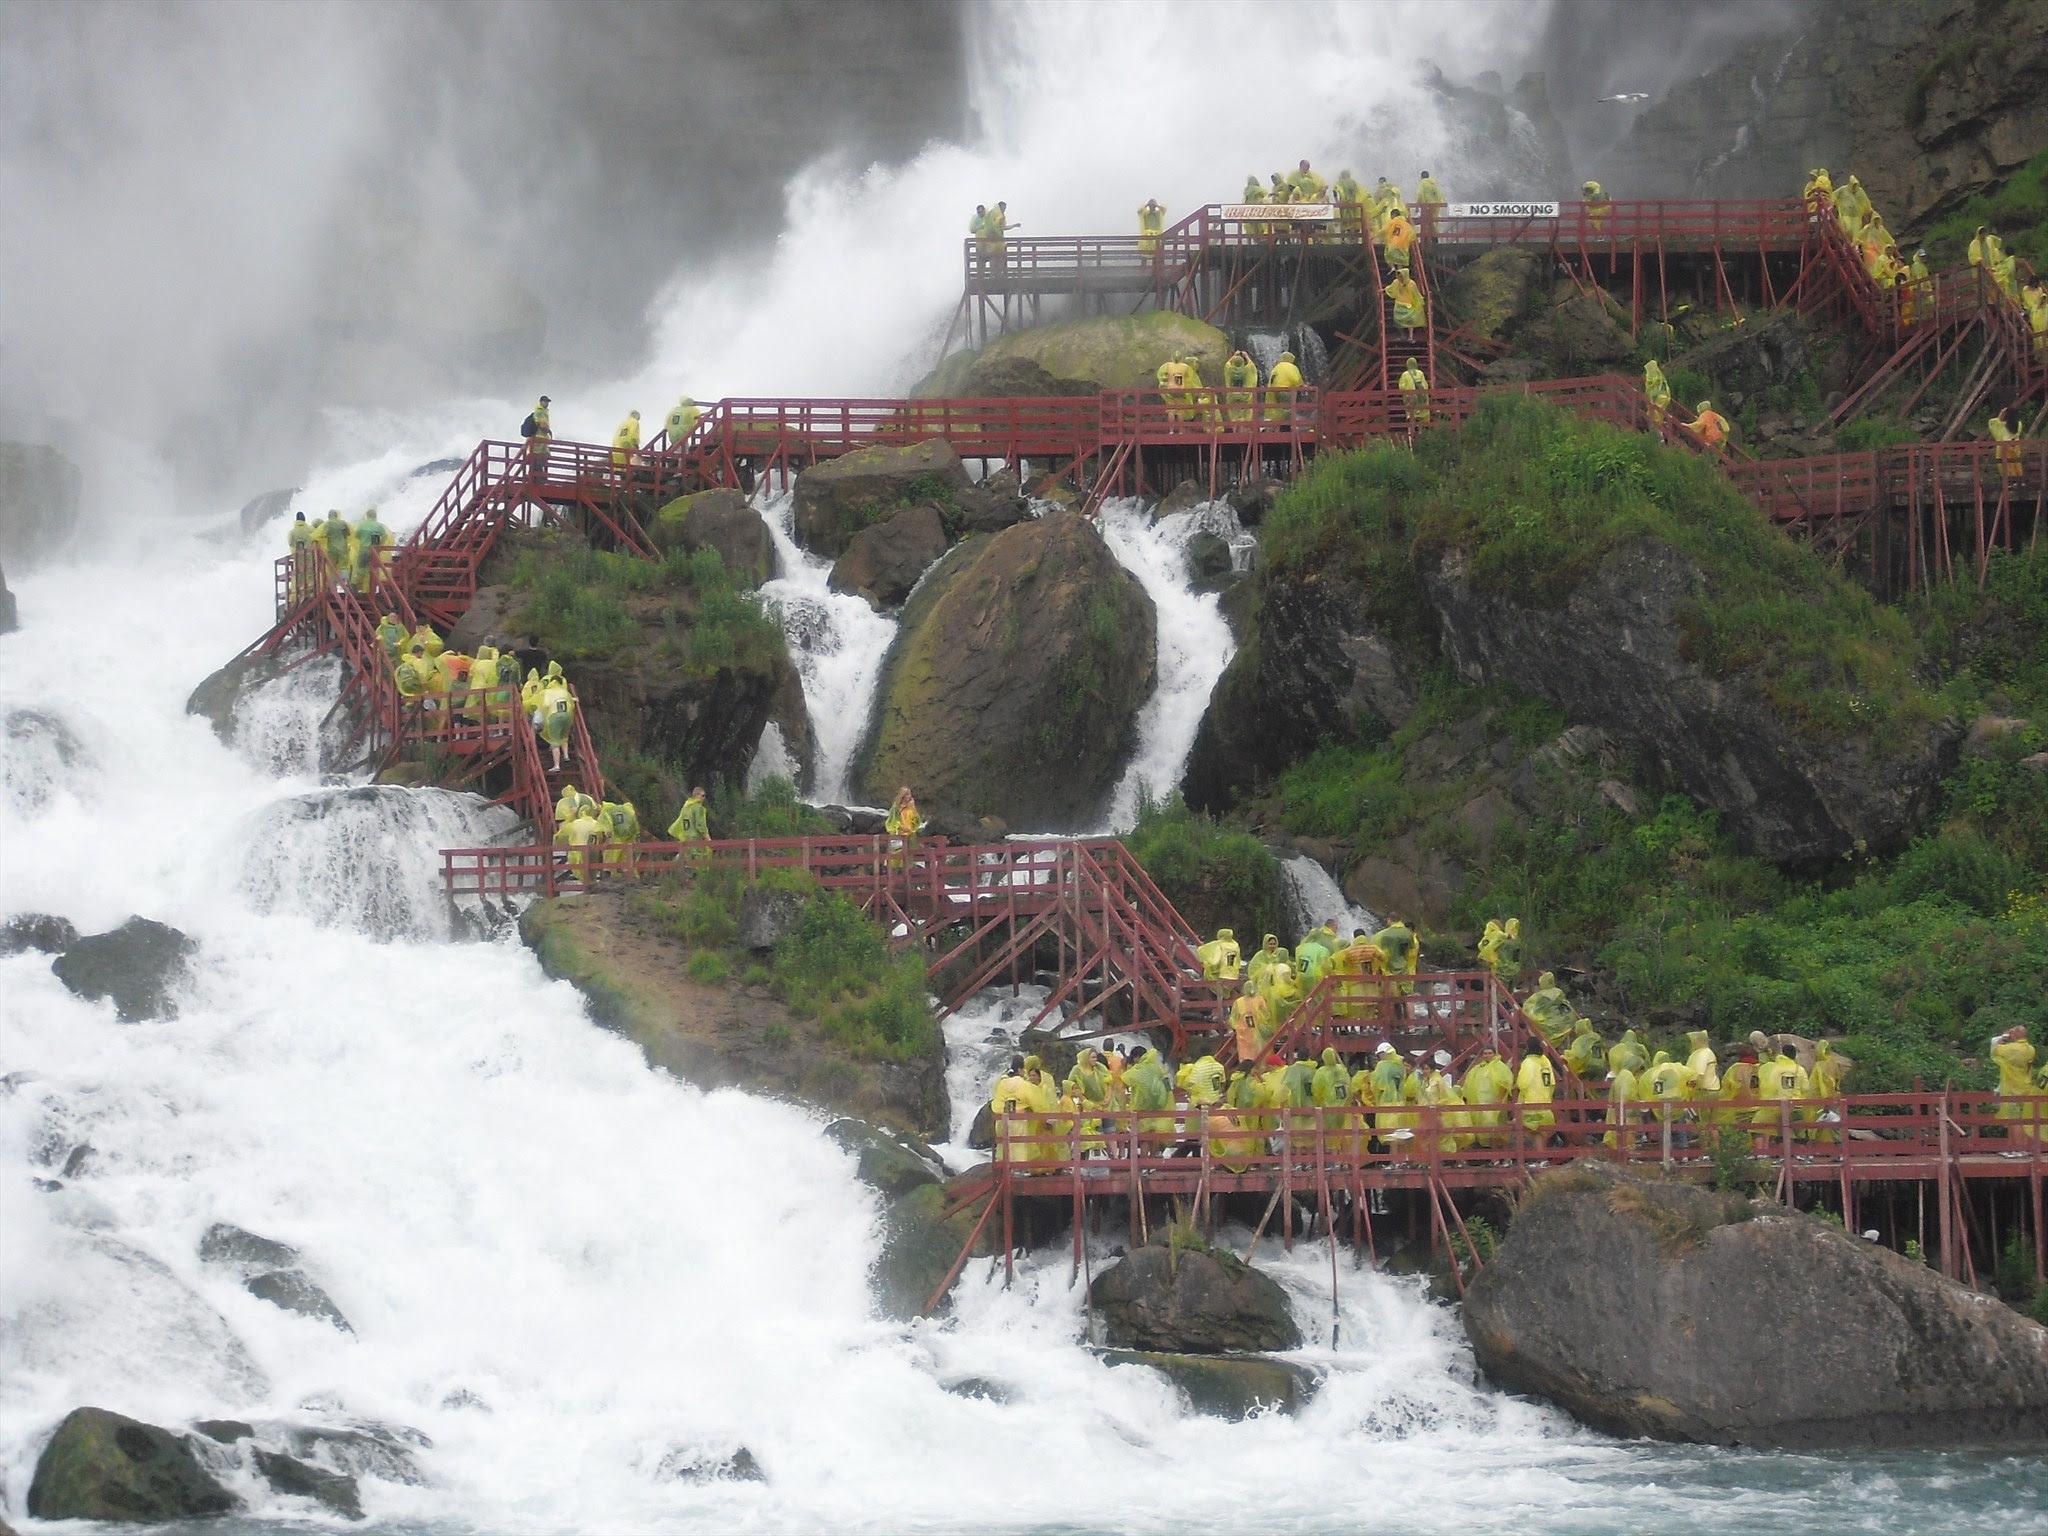 Cave of the Winds - Niagara Falls, NY Image